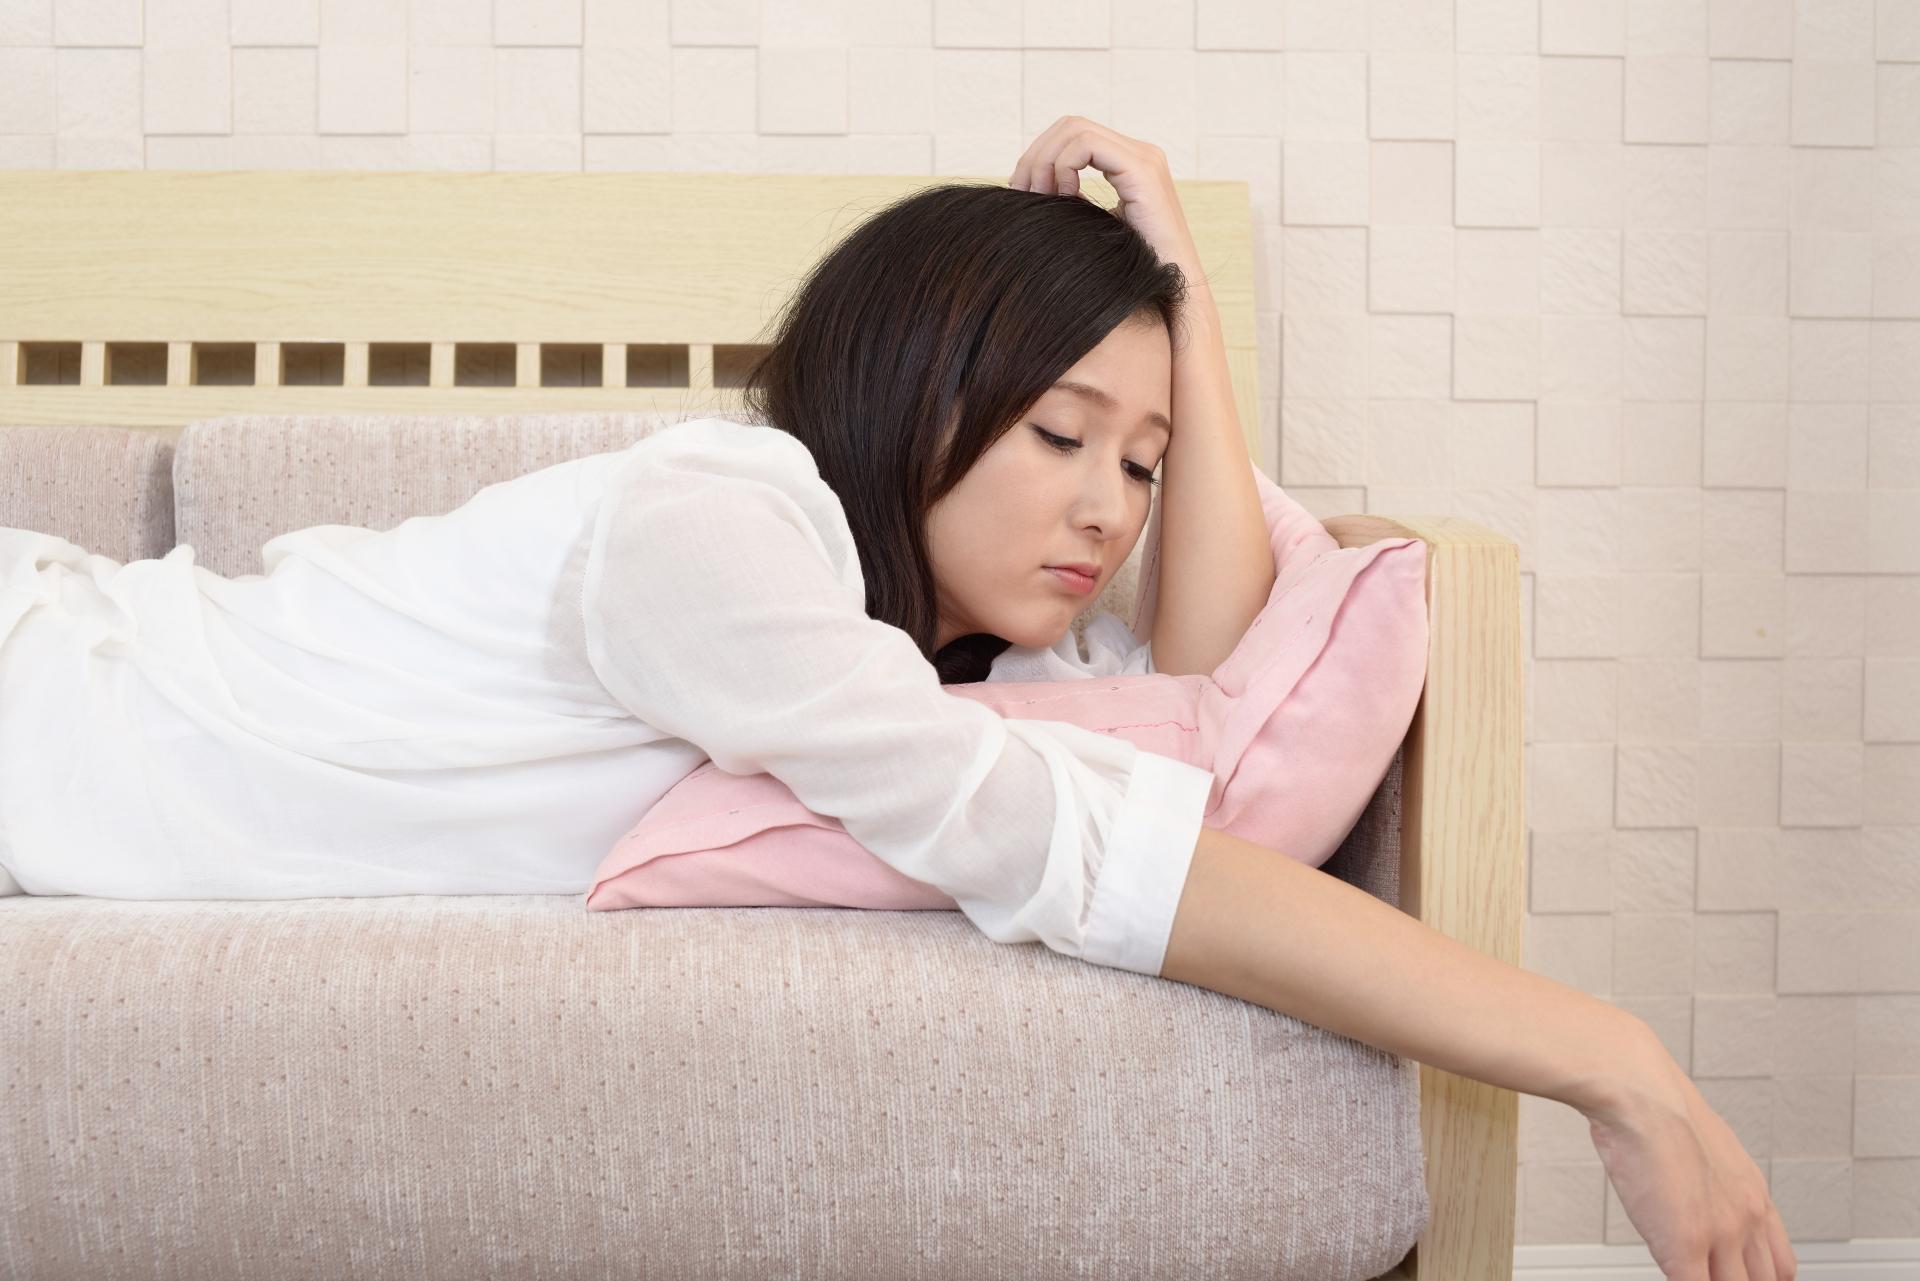 May Sickness: A Japanese Phenomenon